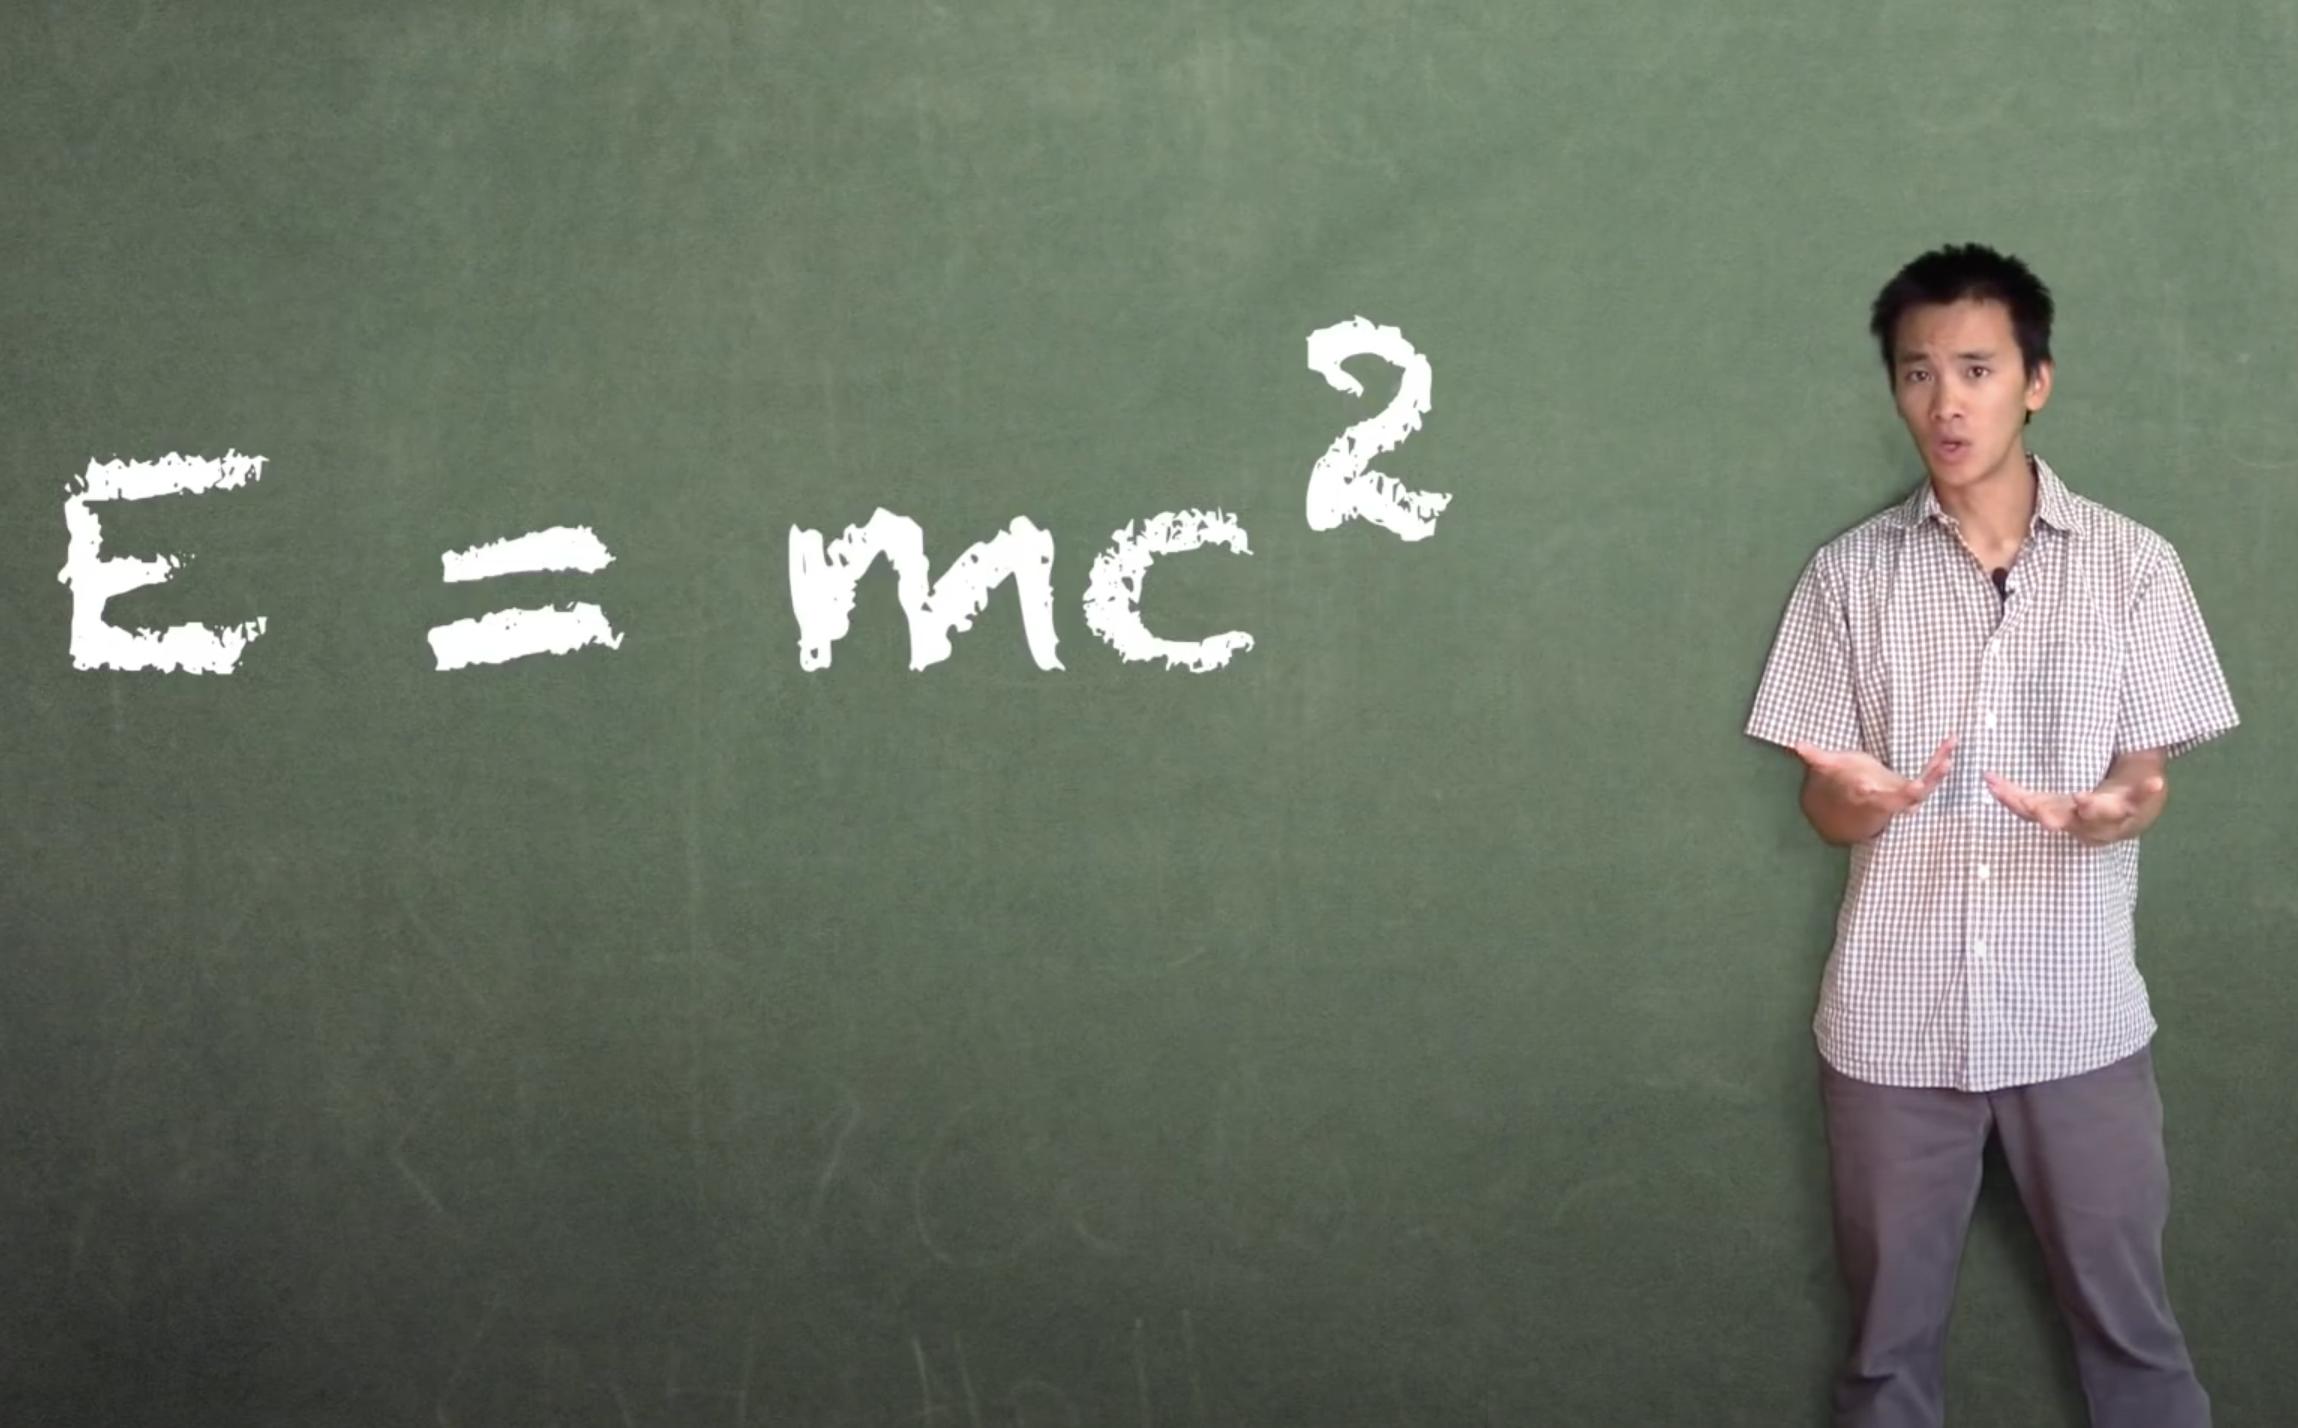 E=mc^2 (vidéo)